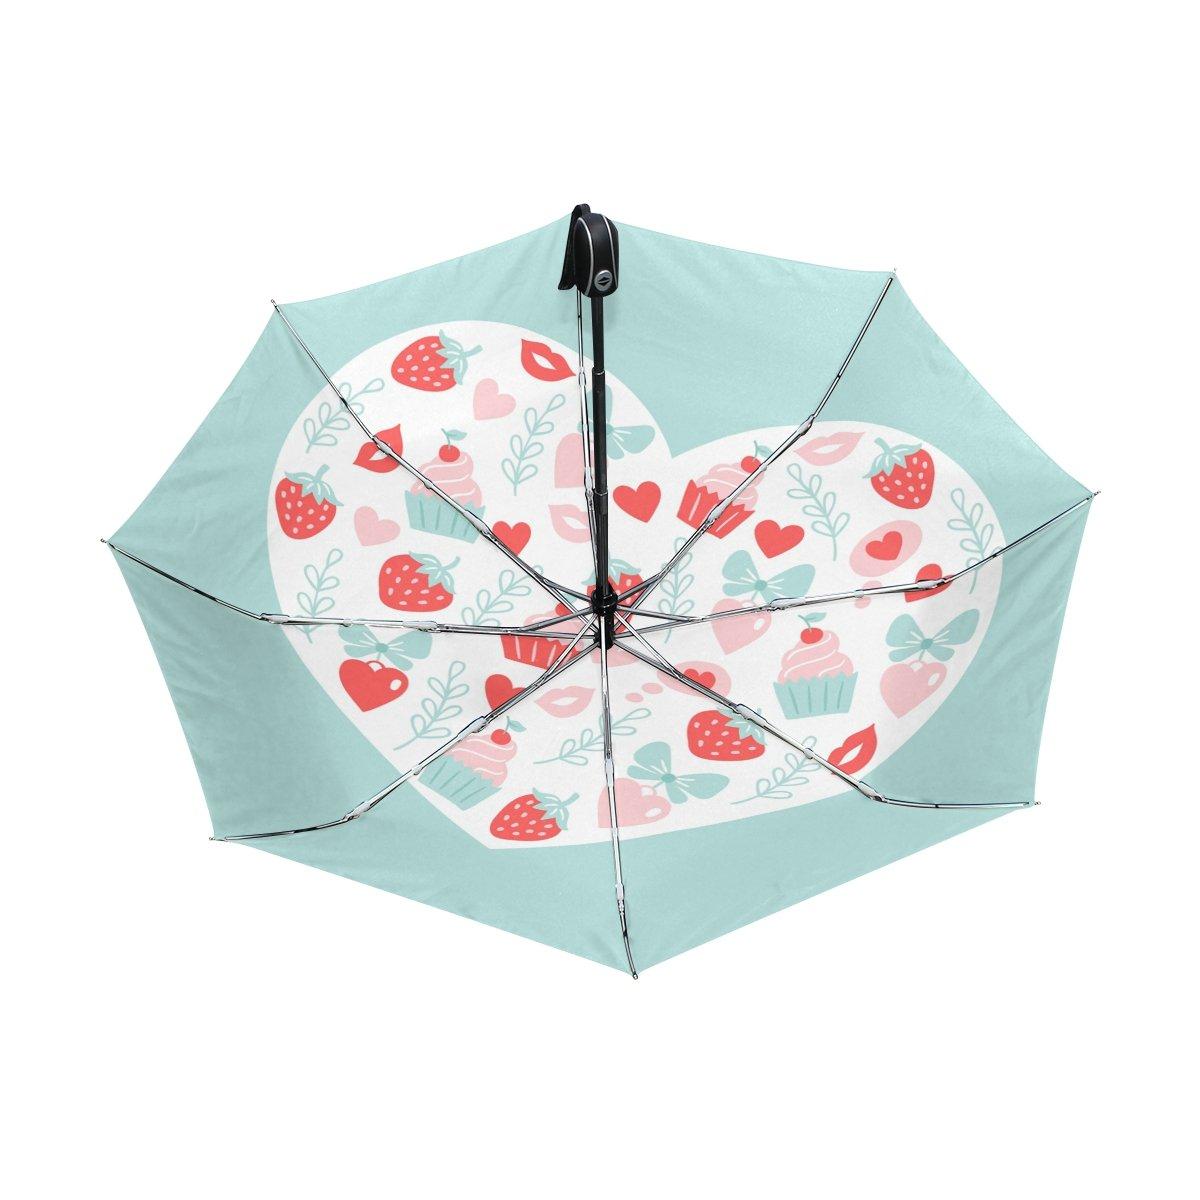 7c4feb811345 Amazon.com : baihuishop Heart Gift Butterfly Strawberry Windproof ...